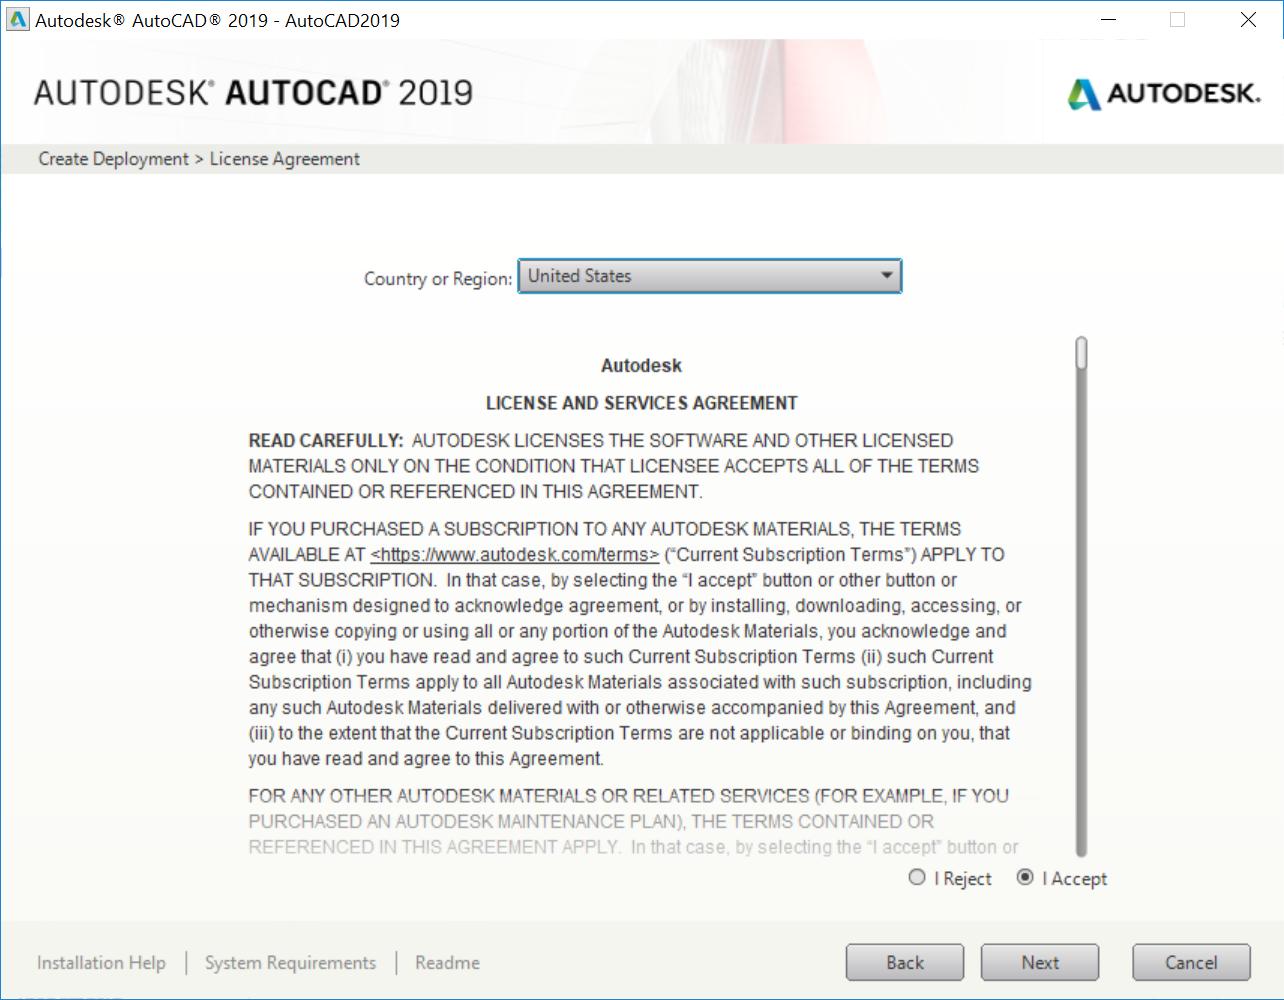 autocad2019-4